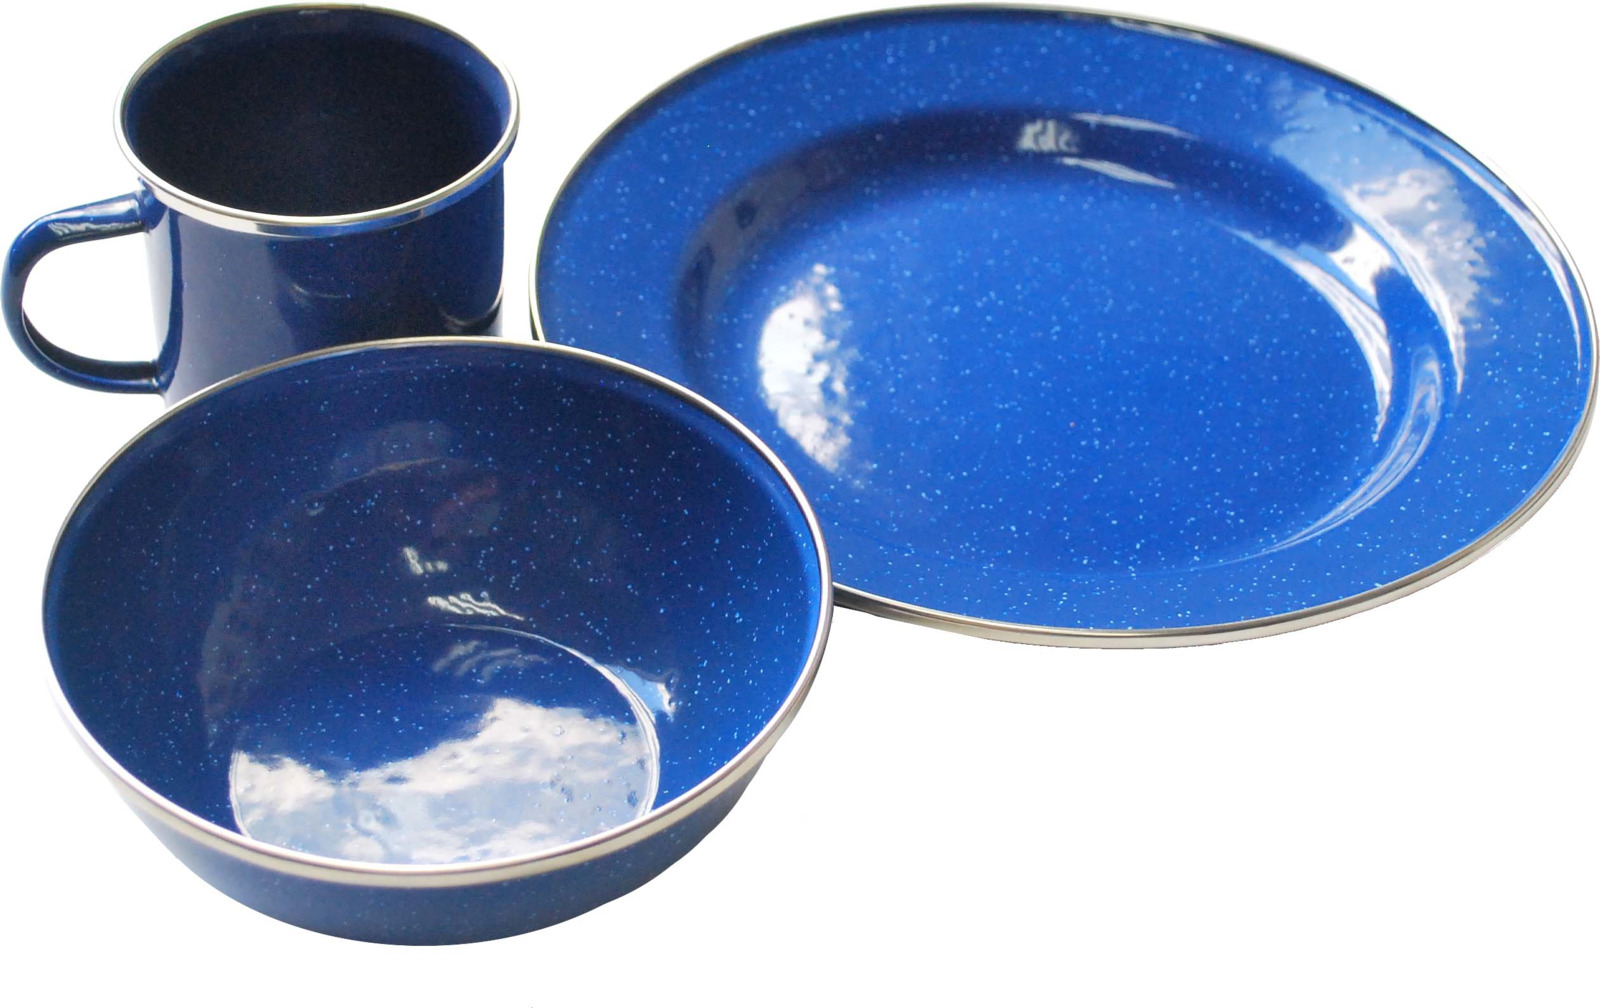 Набор походной посуды Tramp, цвет: синий. TRC-074 tramp trc 031